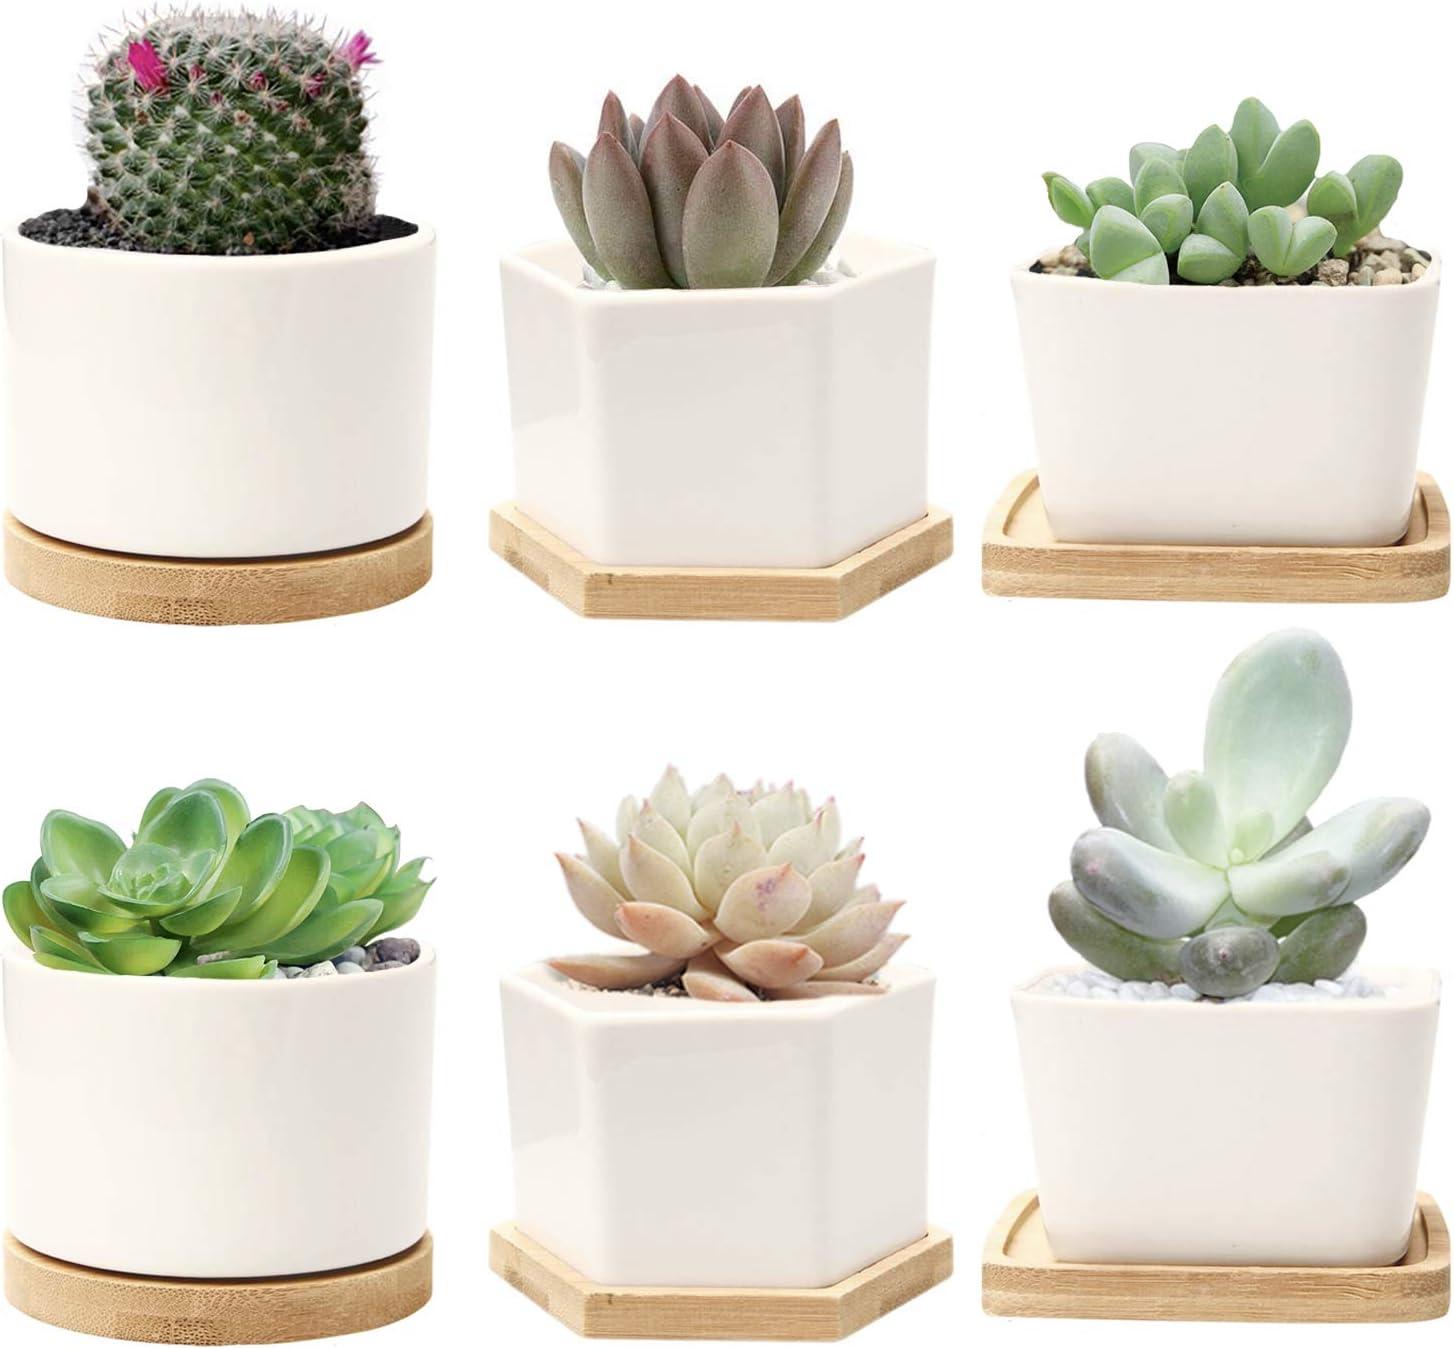 SUCCULENT POT PLANTERS 2.5 inch with Drainage Ceramic Set of 6,Tiny Porcela